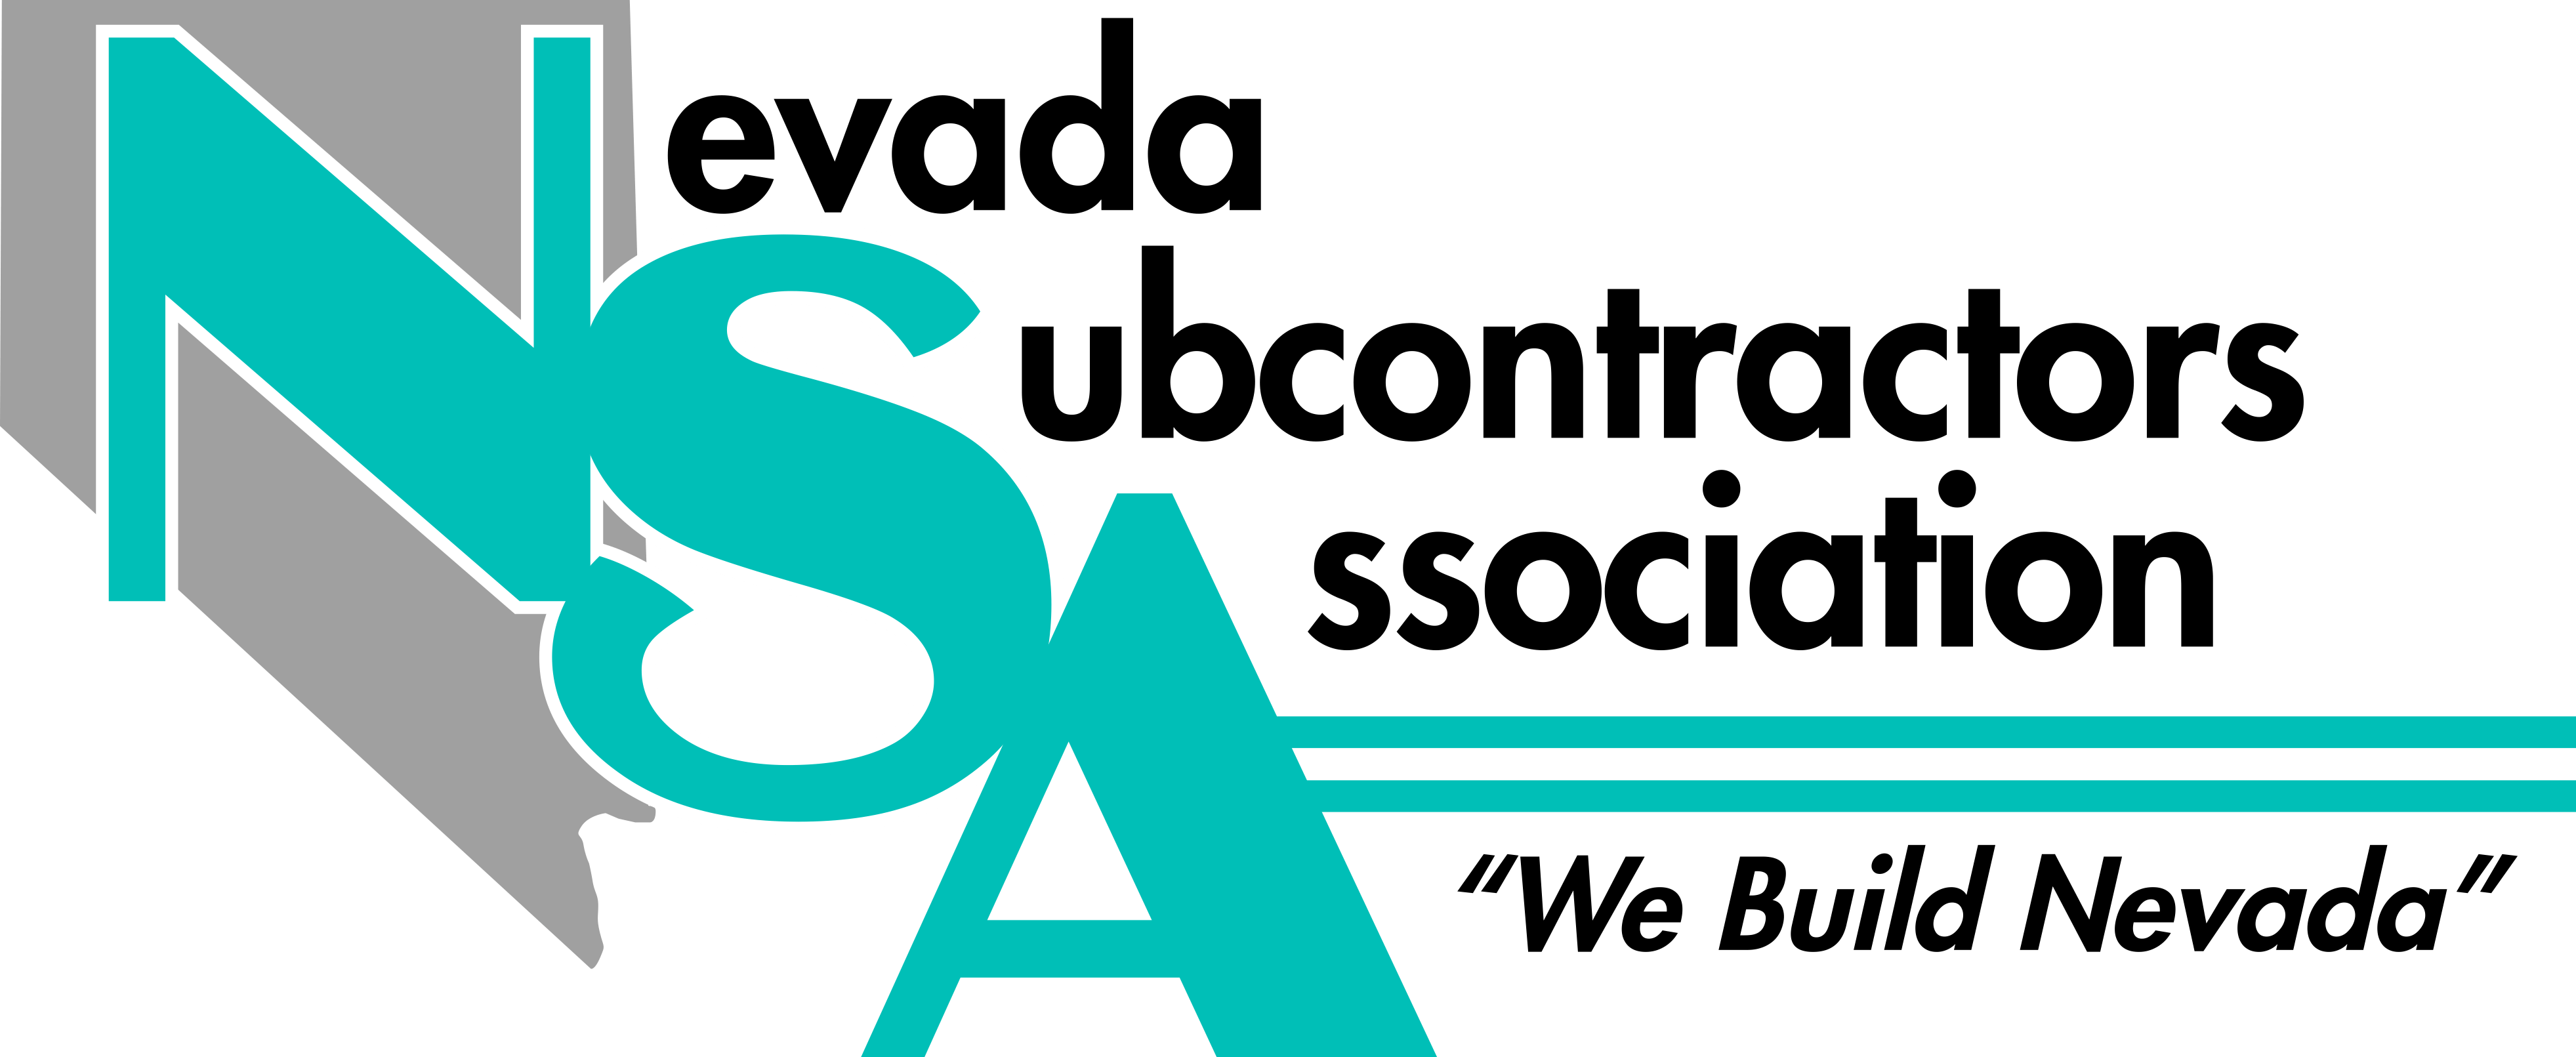 Nevada Subcontractors Association